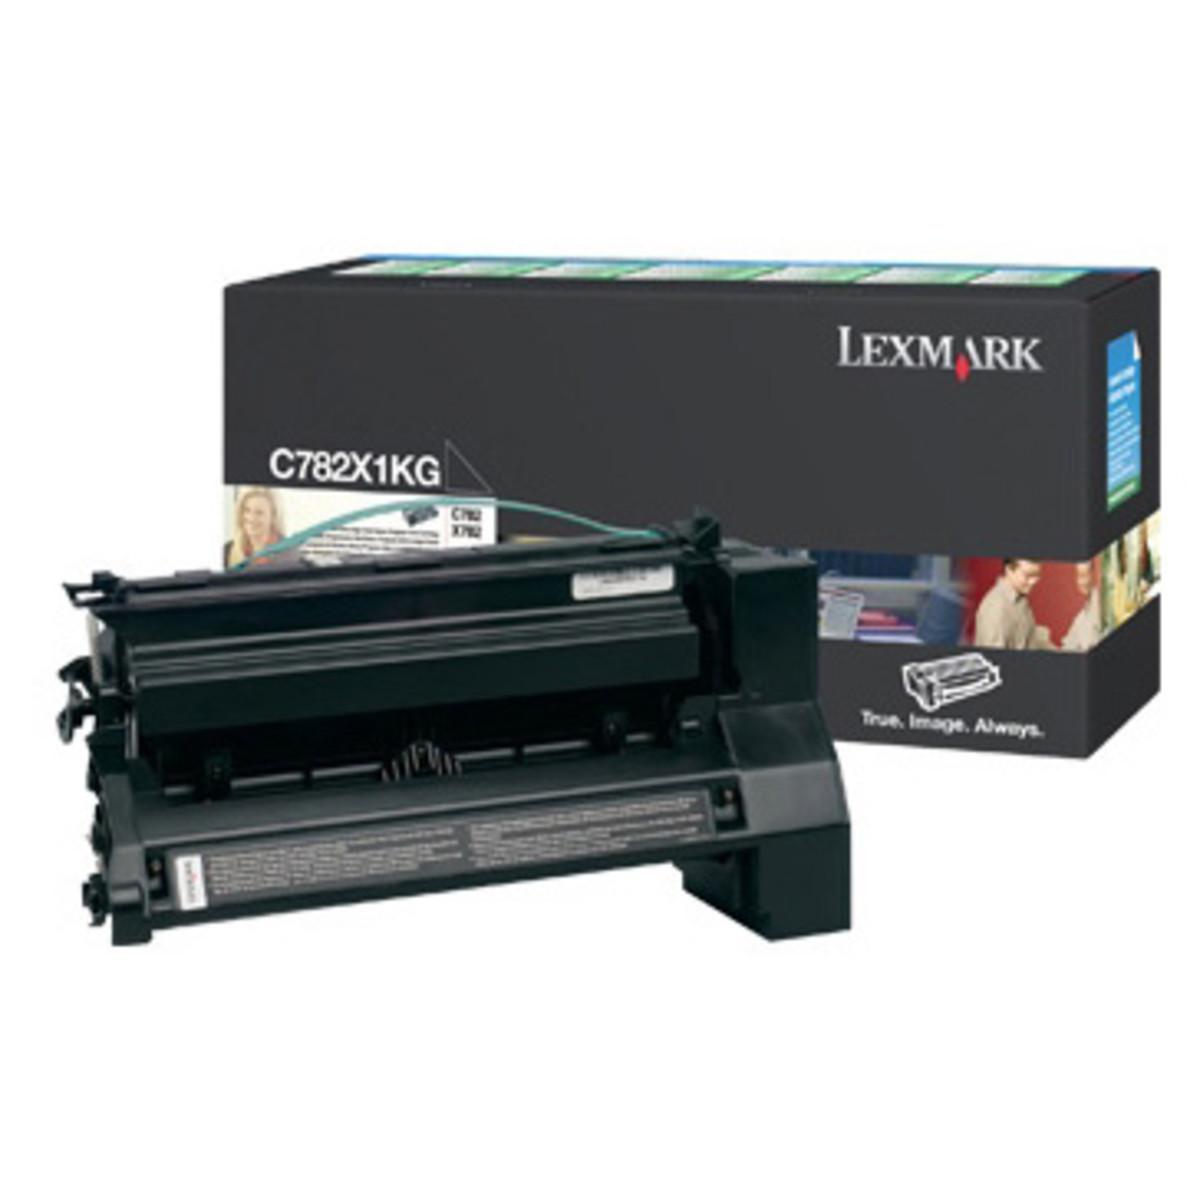 Lexmark C782X1KG Black Toner Cartridge- High Yield